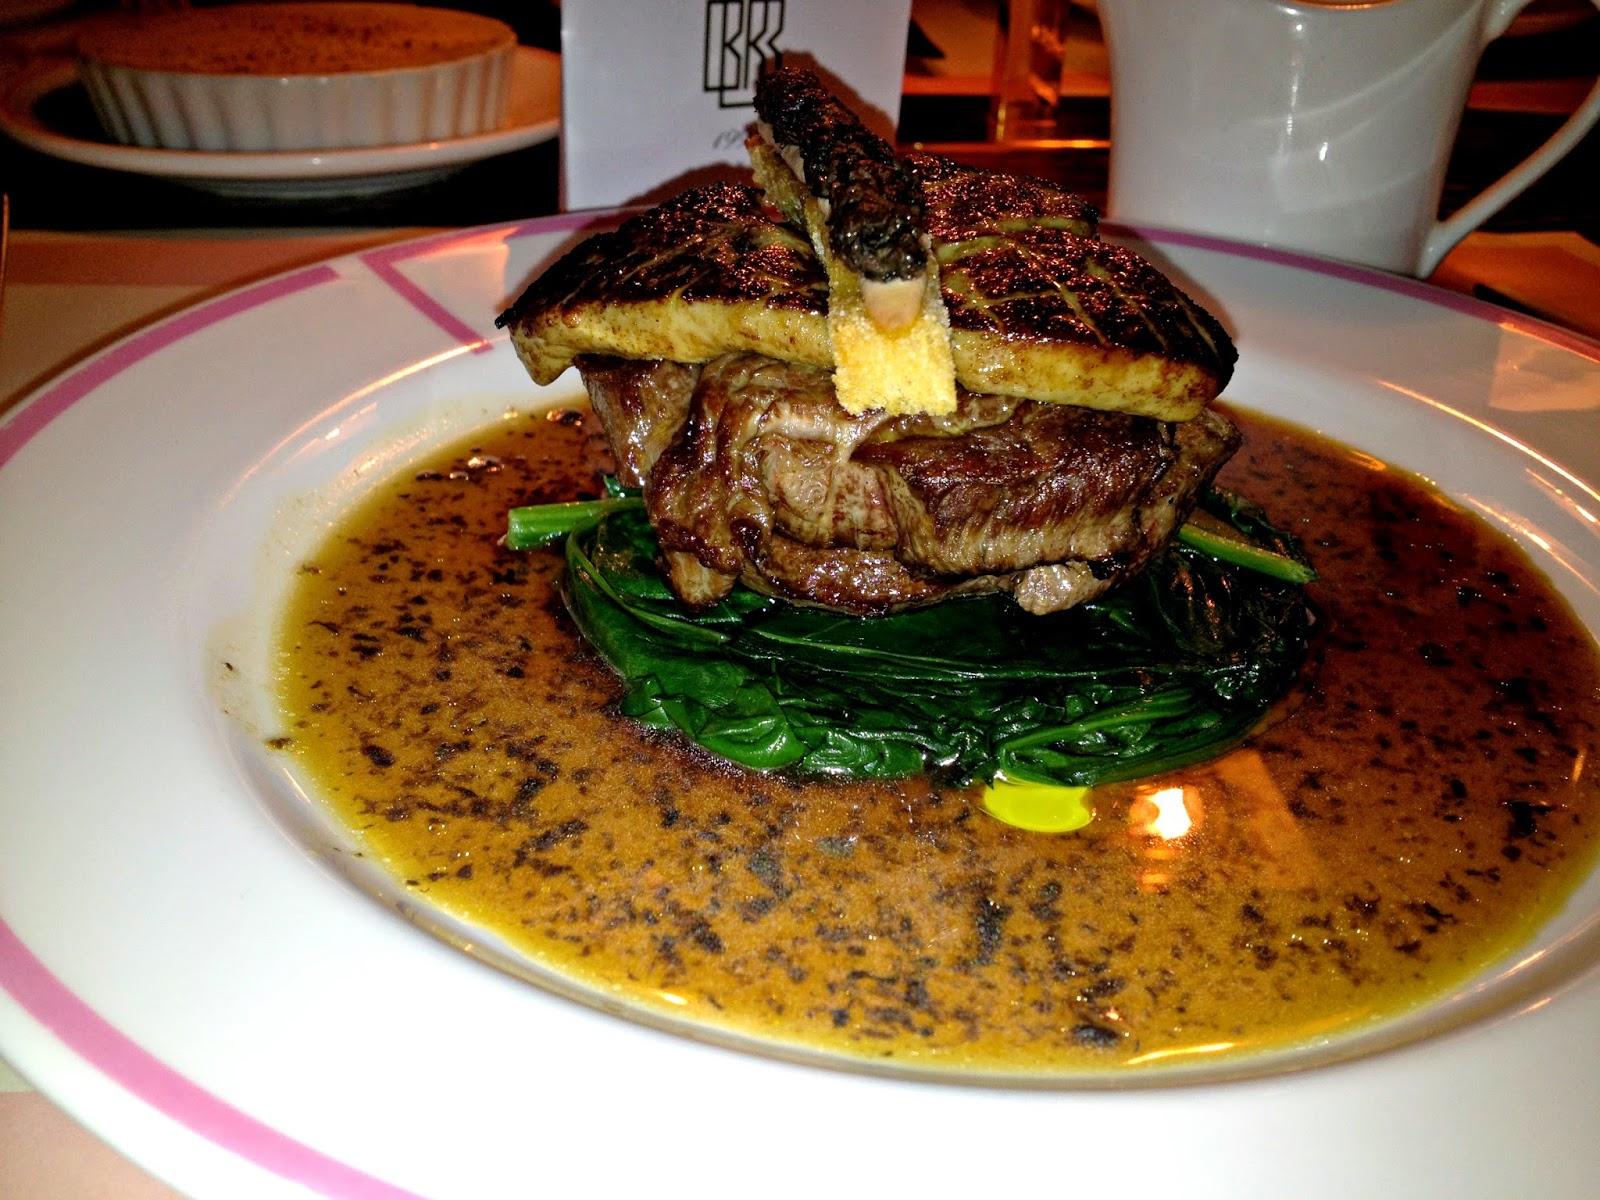 Bob Bob Ricard Steak